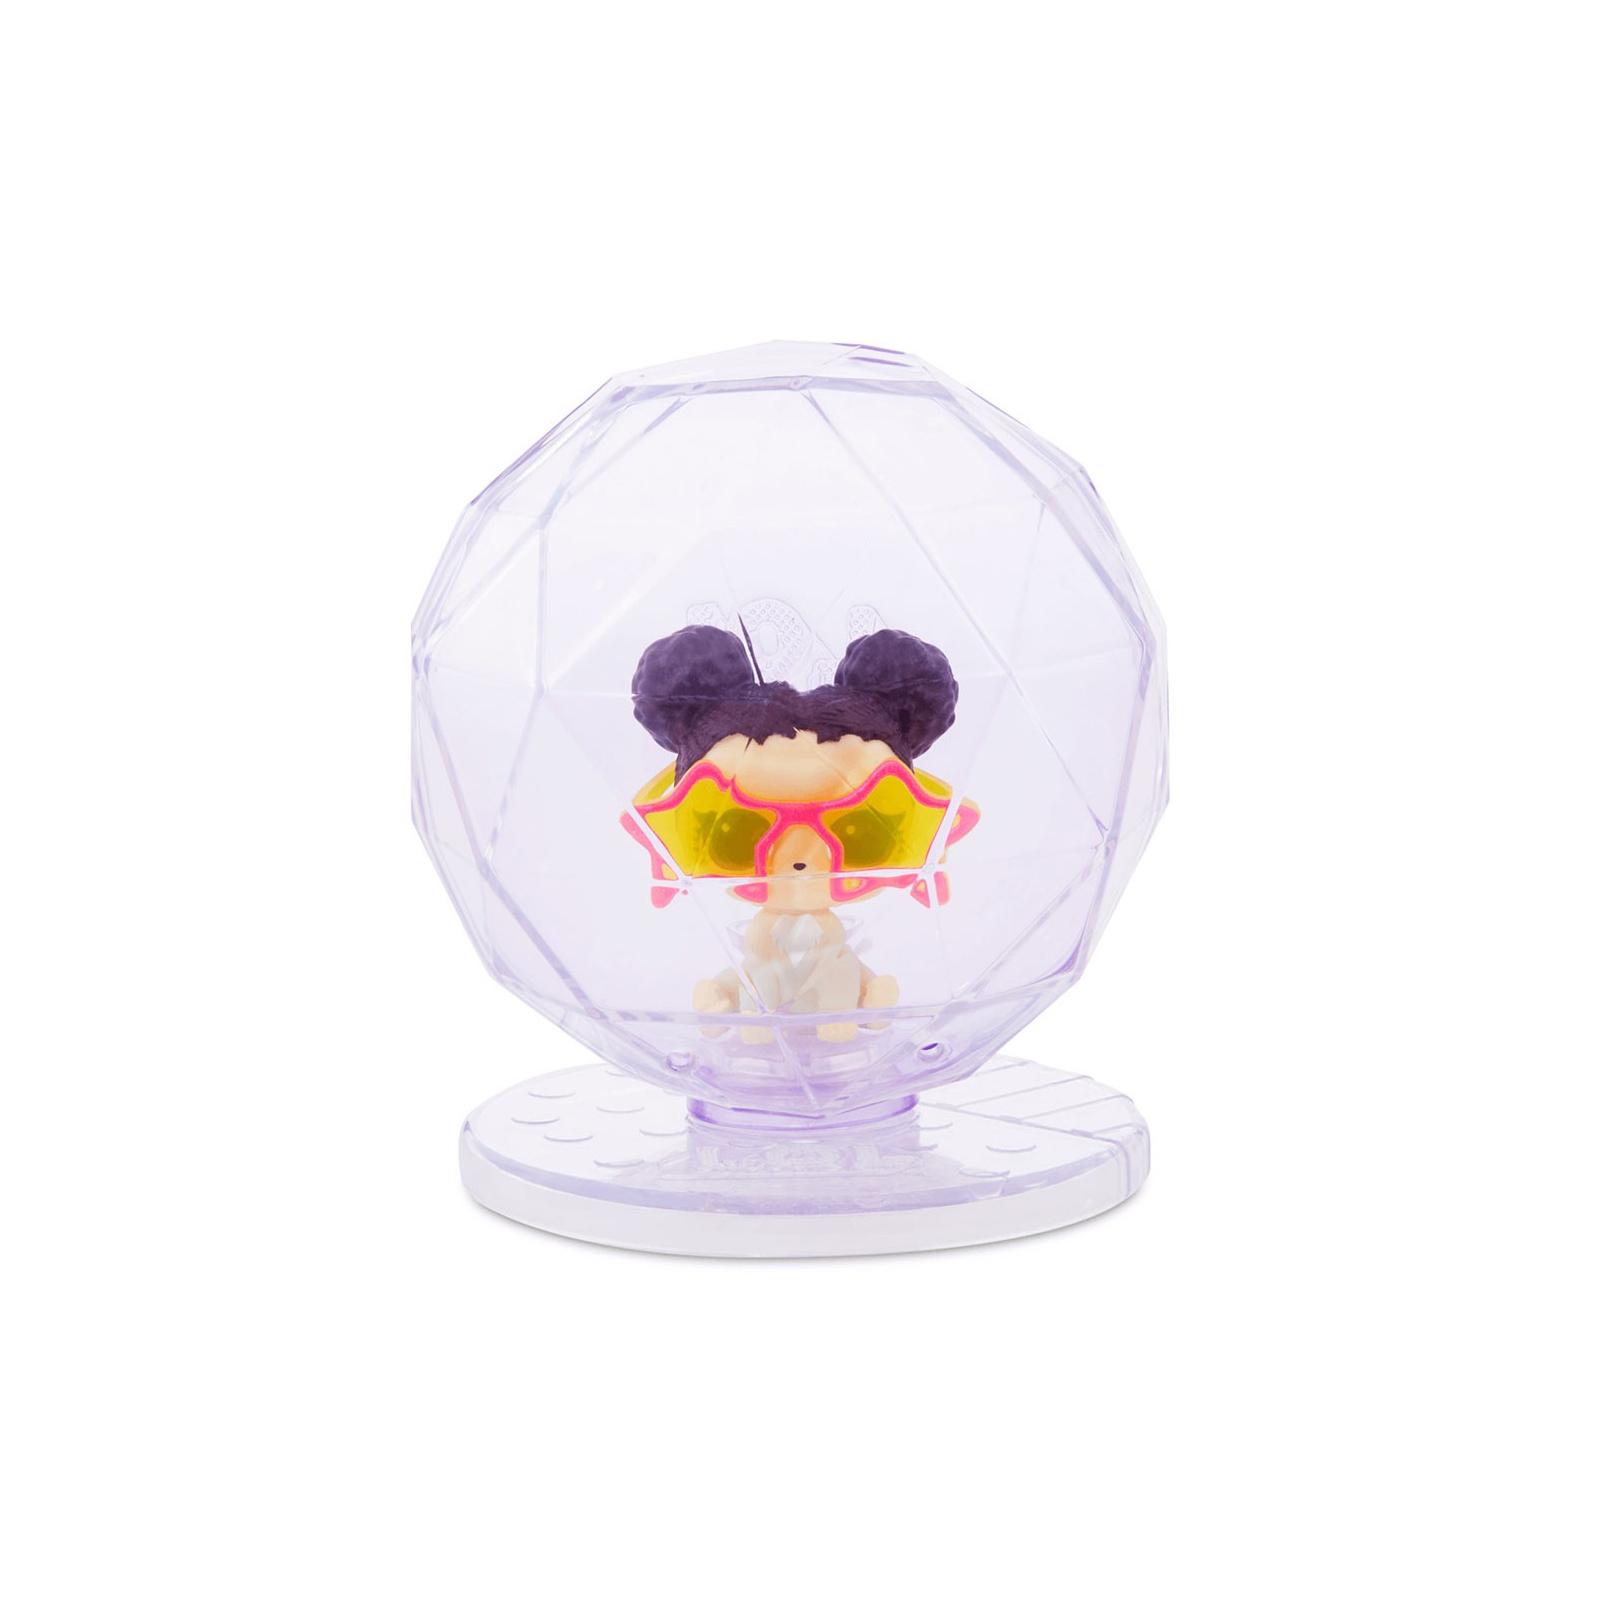 Кукла L.O.L. Surprise! серии Lil's Winter Disco - Малыши (559672) изображение 8